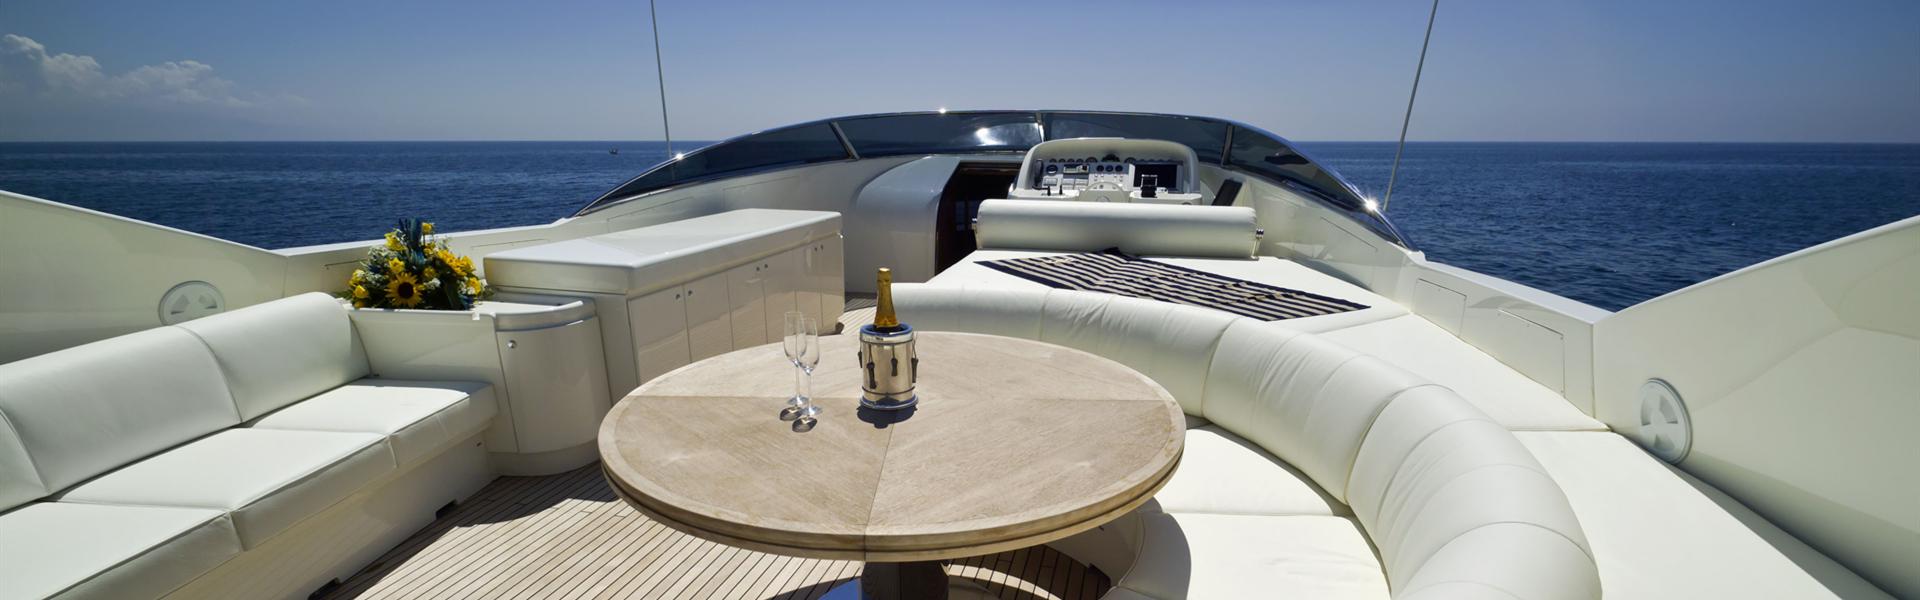 https://yacht-v1.oss-cn-shenzhen.aliyuncs.com/images/travels20200109/5e169ae9496f5.jpeg